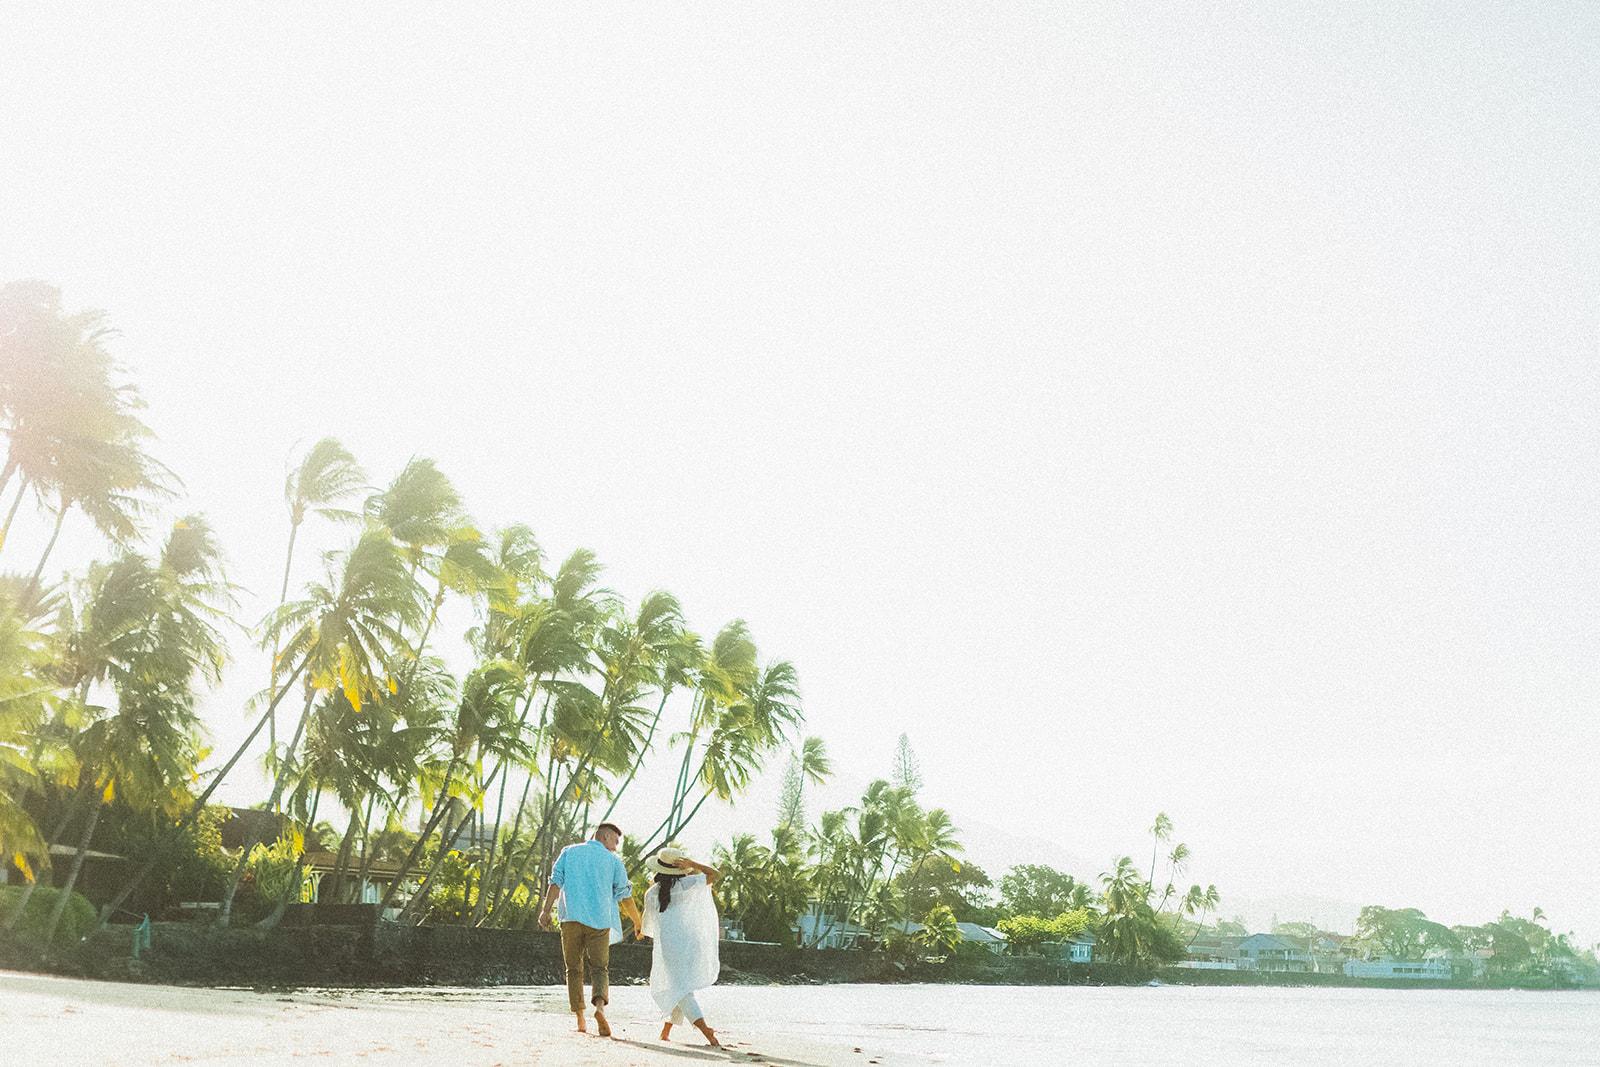 maui beach engagement session305.jpg